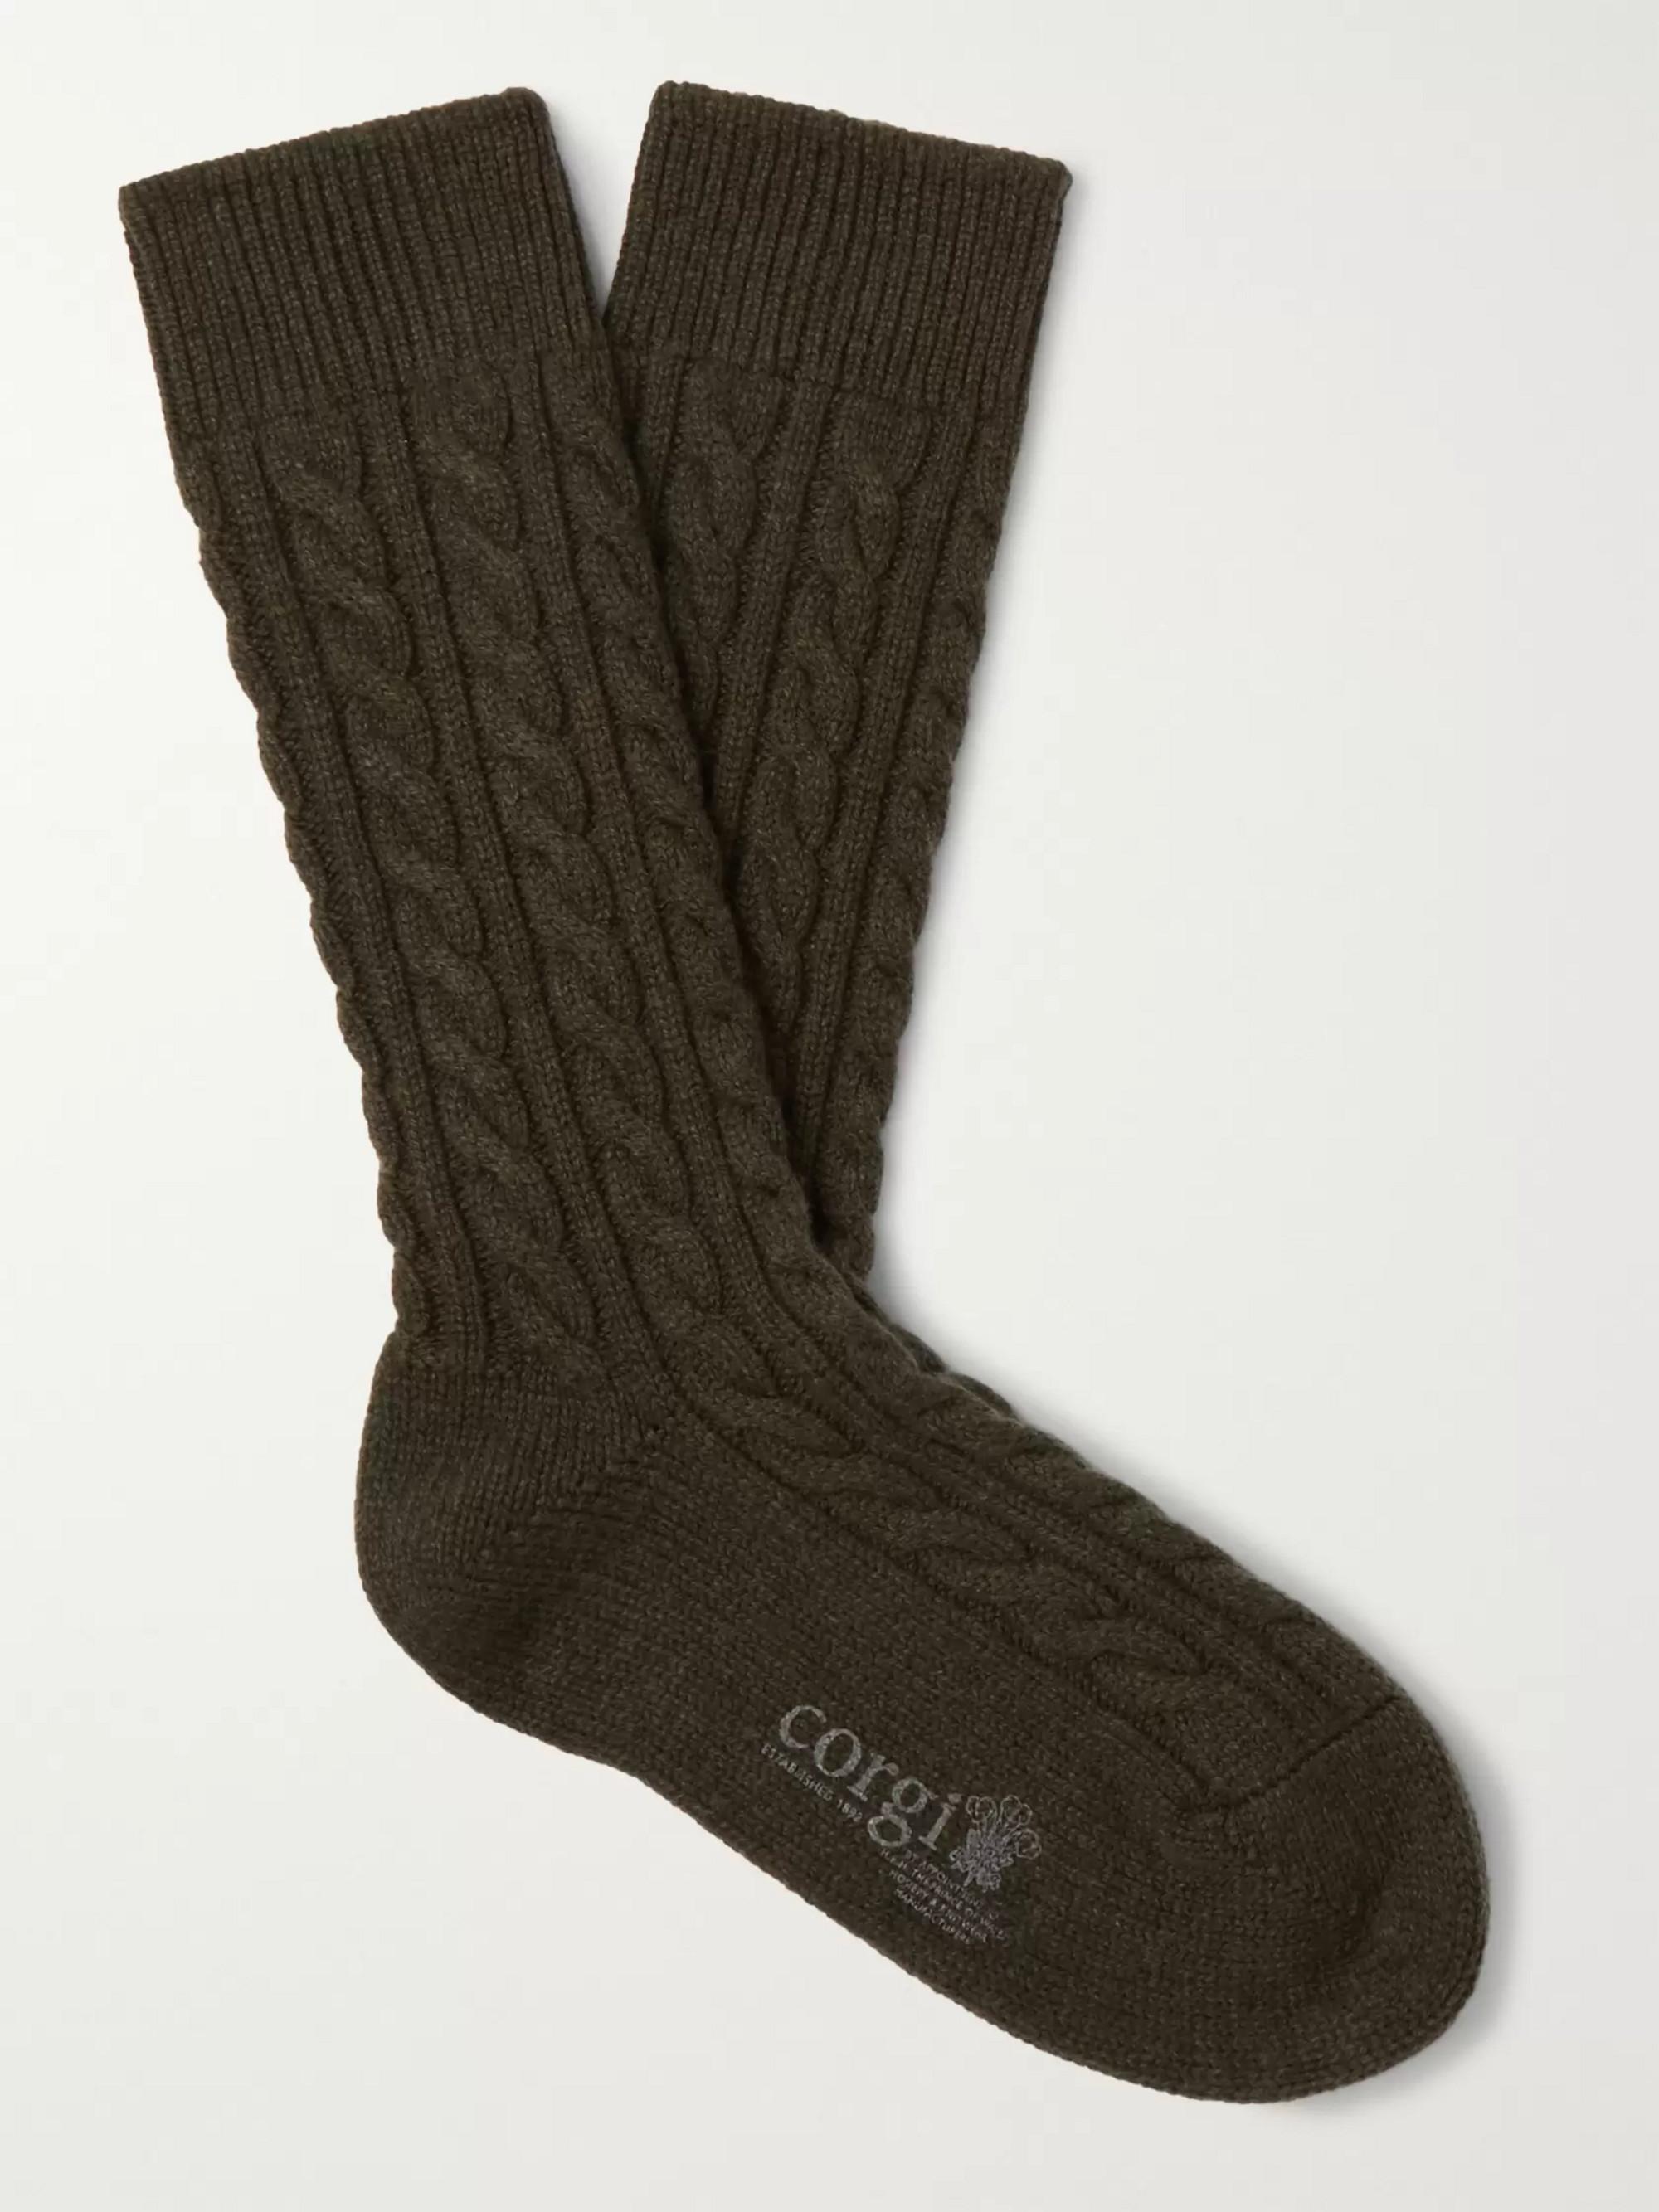 Kingsman Cable-Knit Cashmere Socks